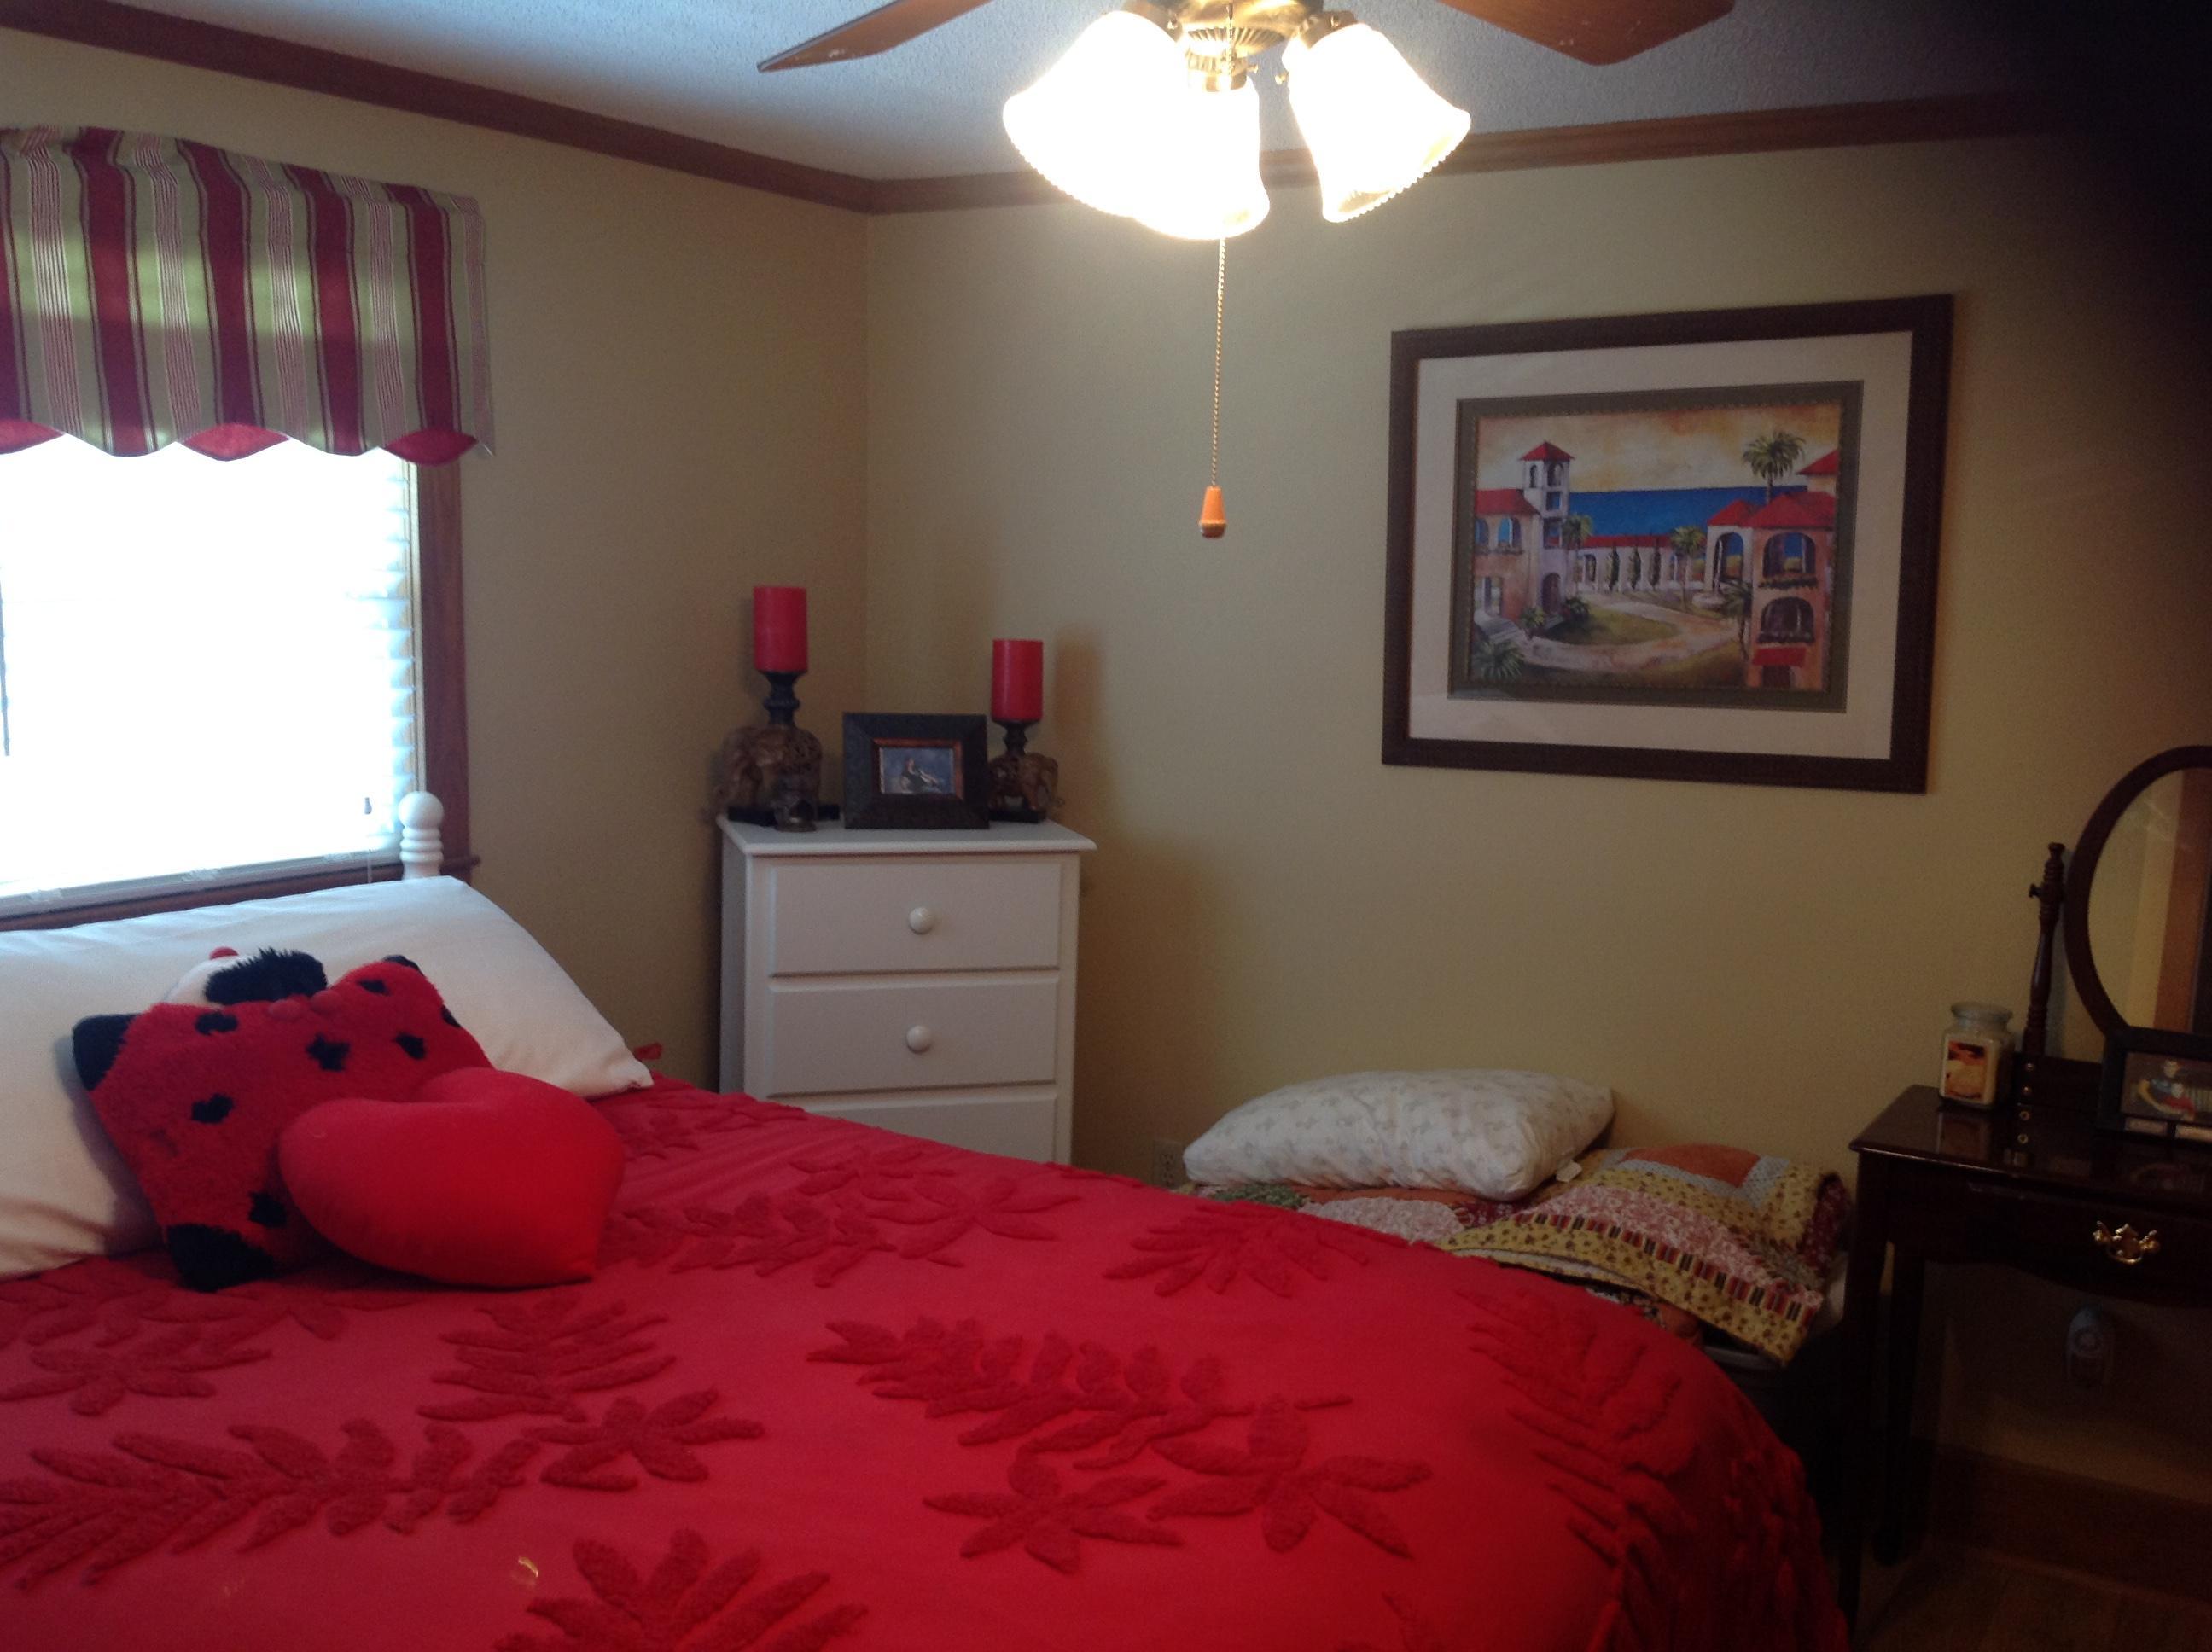 Belvedere II Homes For Sale - 122 Dogwood, Eutawville, SC - 6